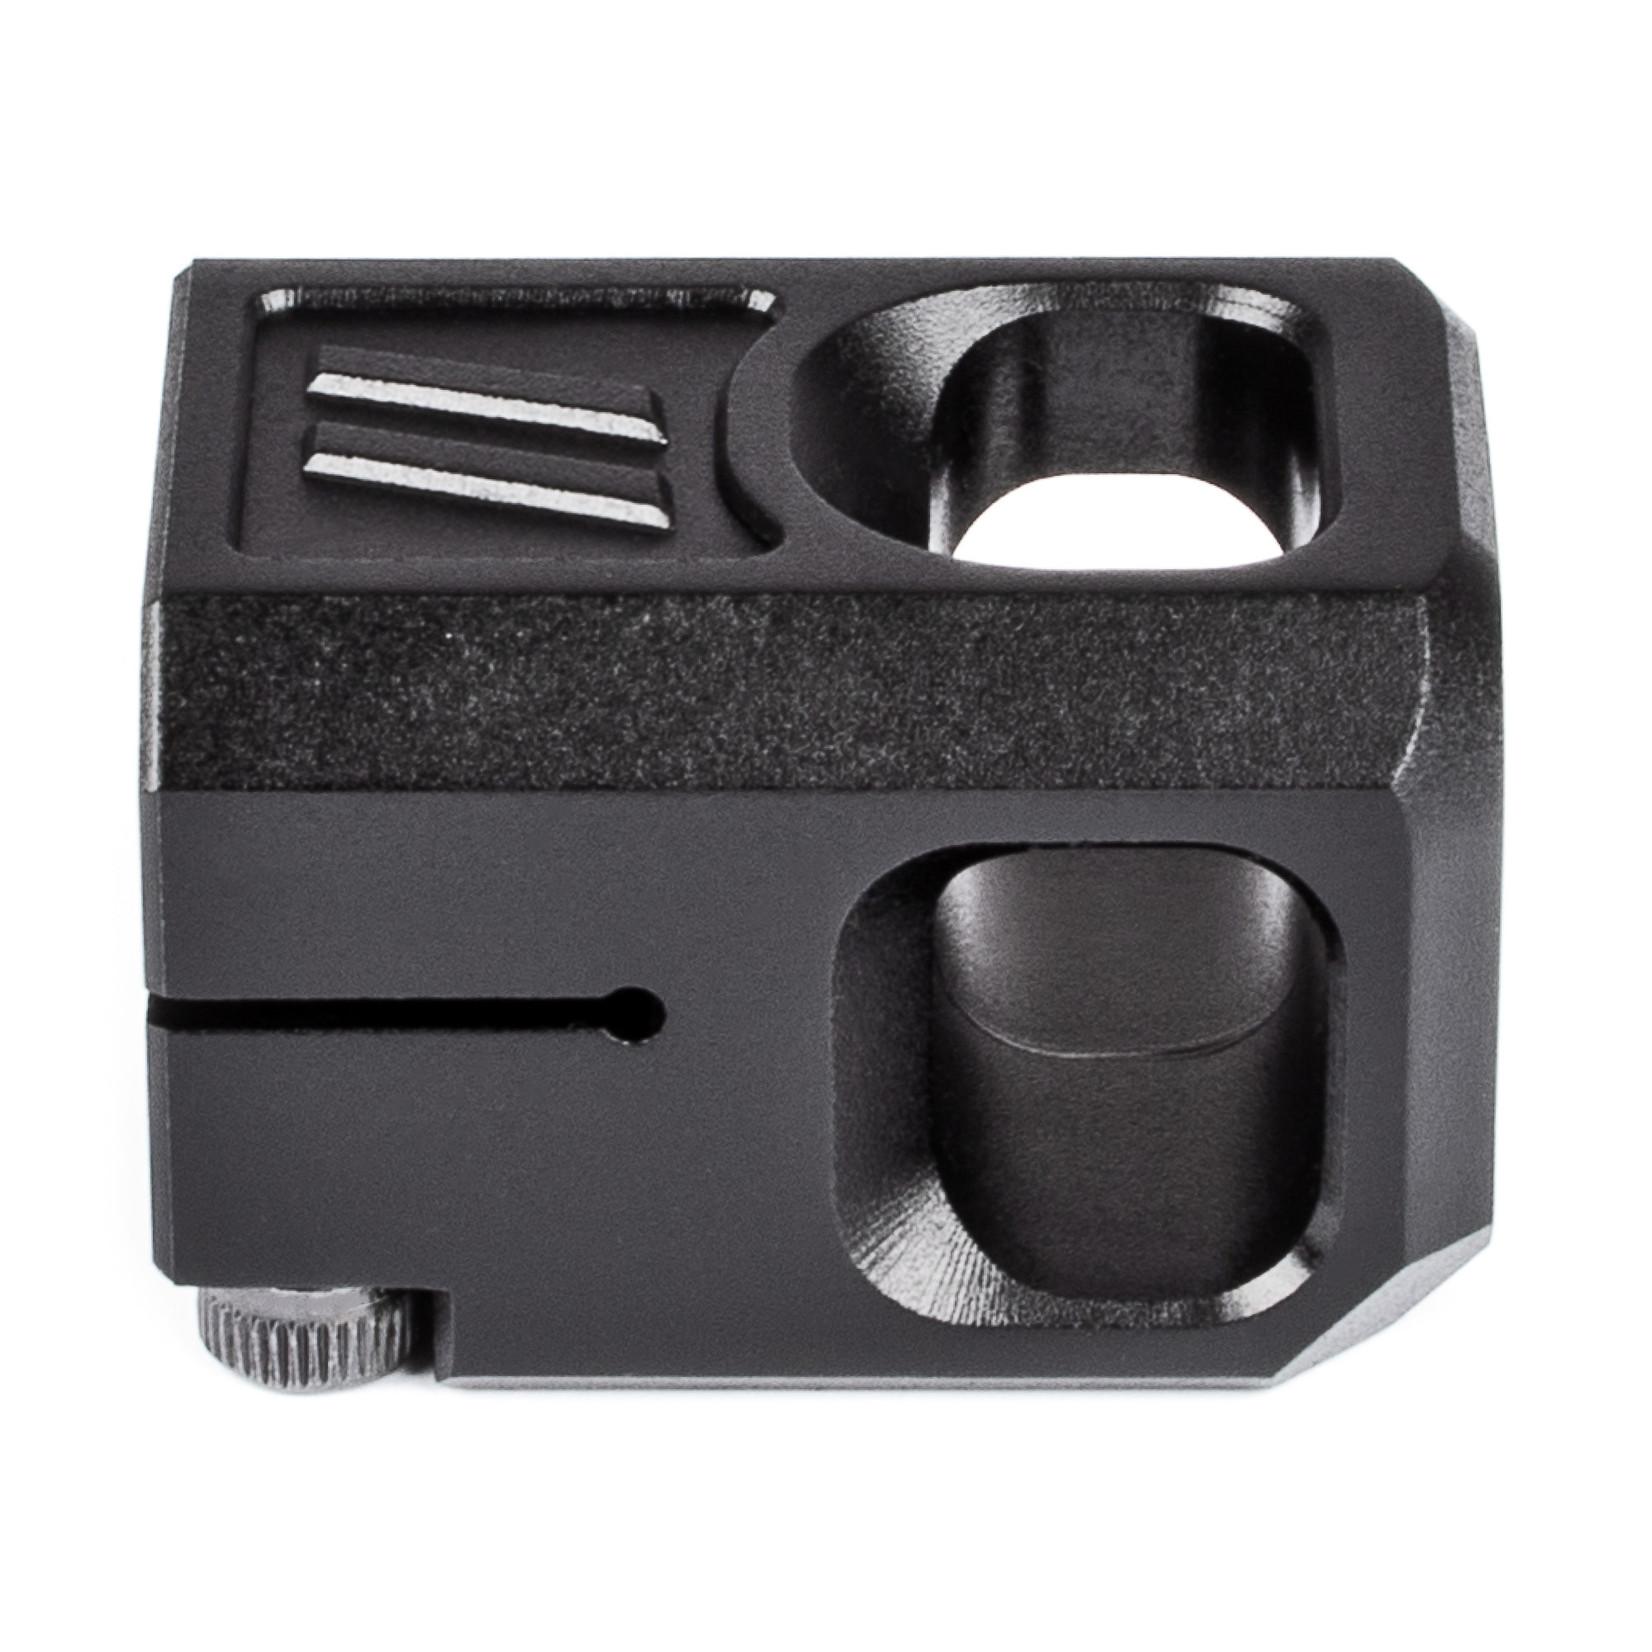 Zev Technologies ZEV Technologies, Pro Comp V2, Compensator, 9 MM, Black, Muzzle Brake/Comp, 1/2X28